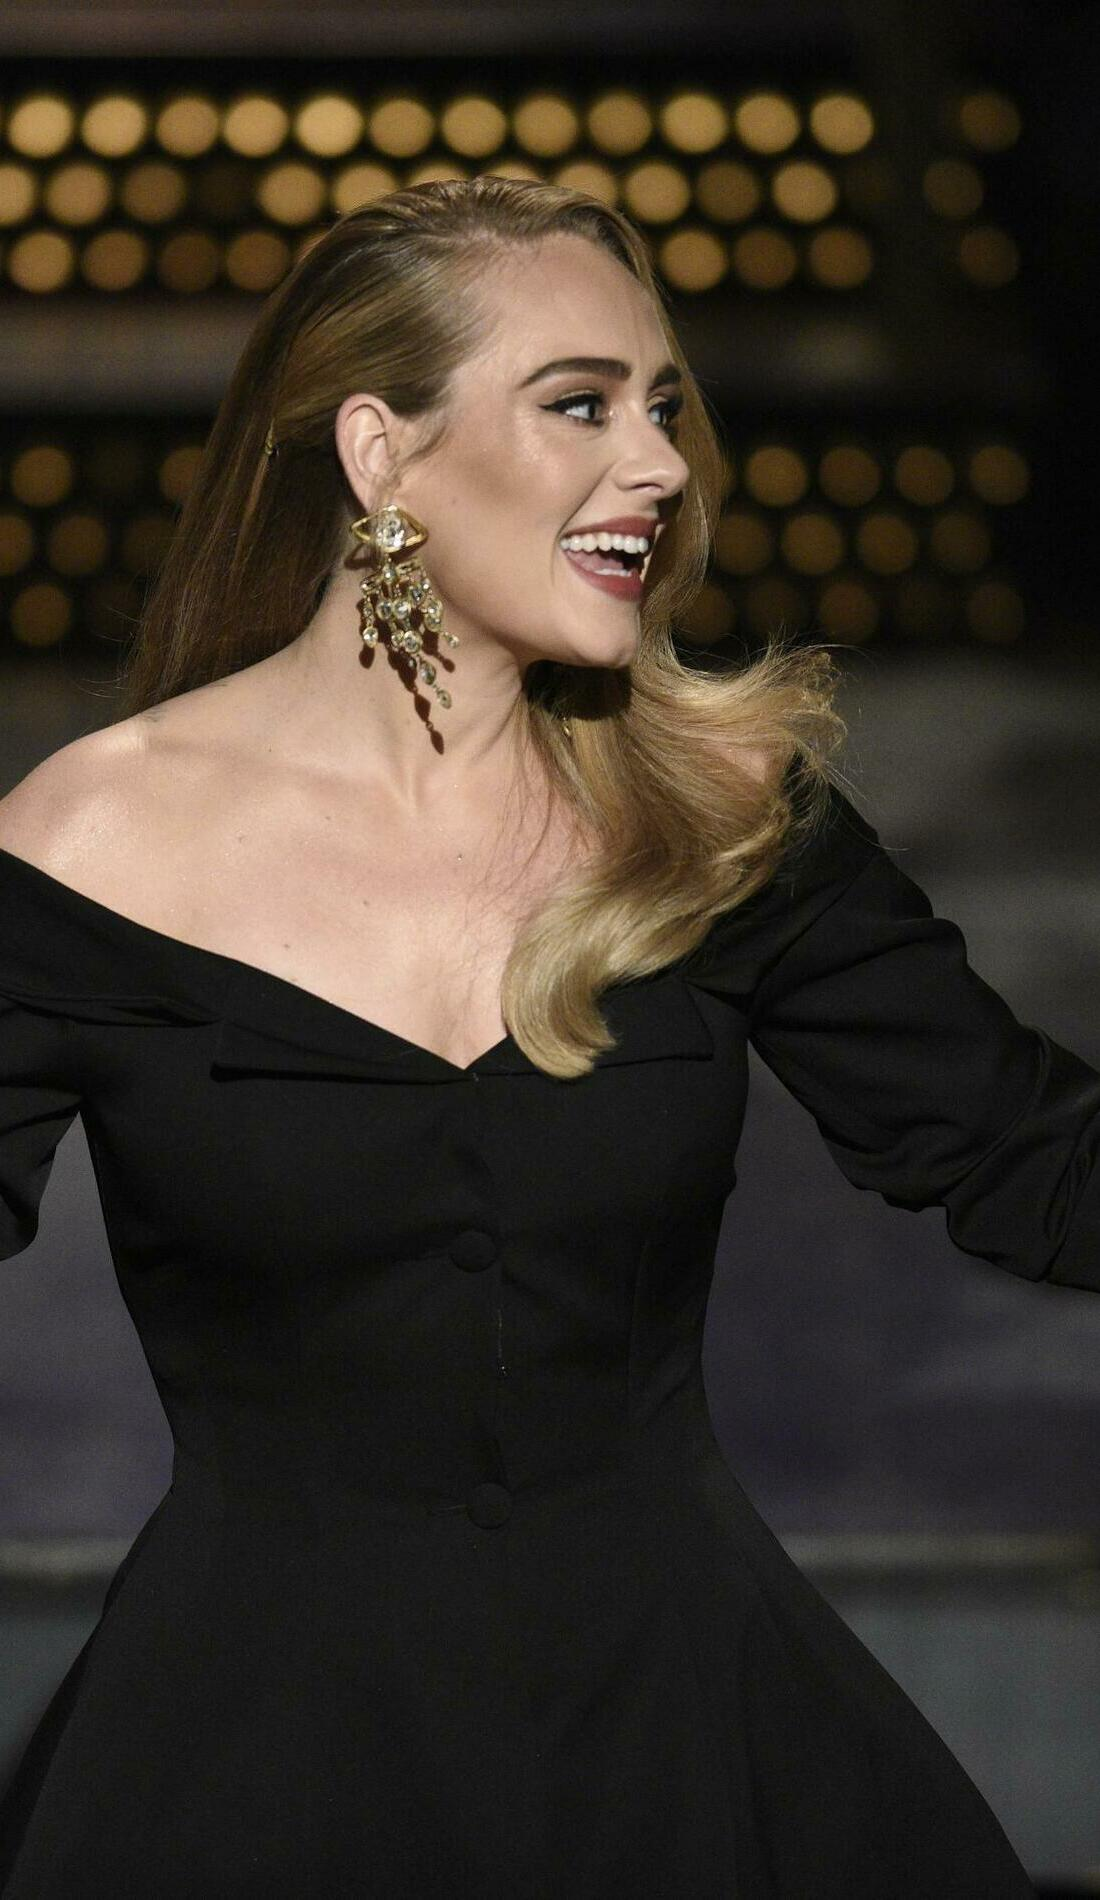 A Adele live event